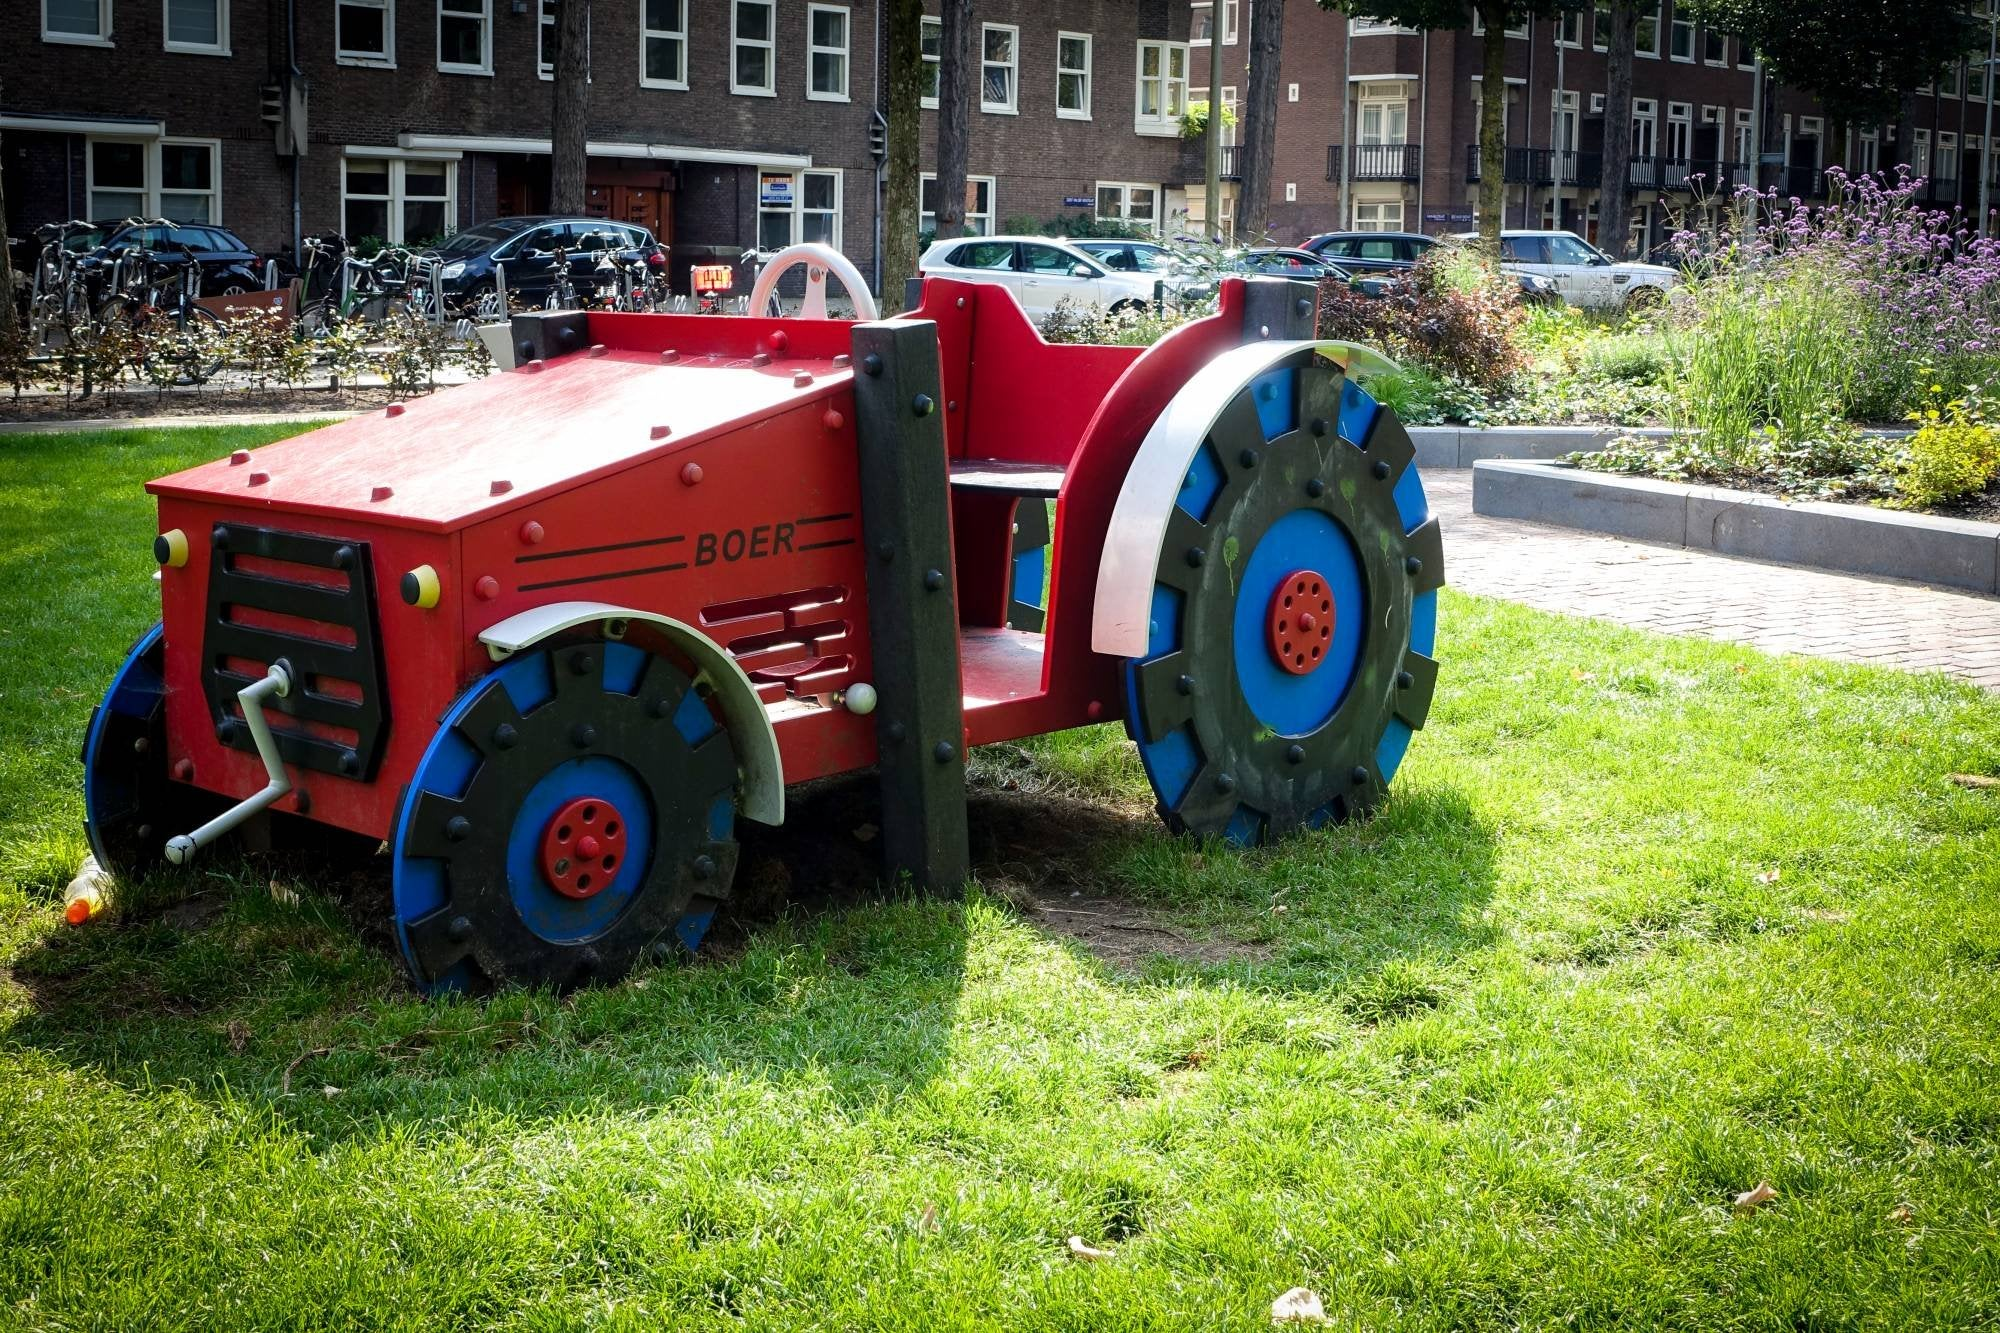 Reijnier Vinkeleskade, Amsterdam